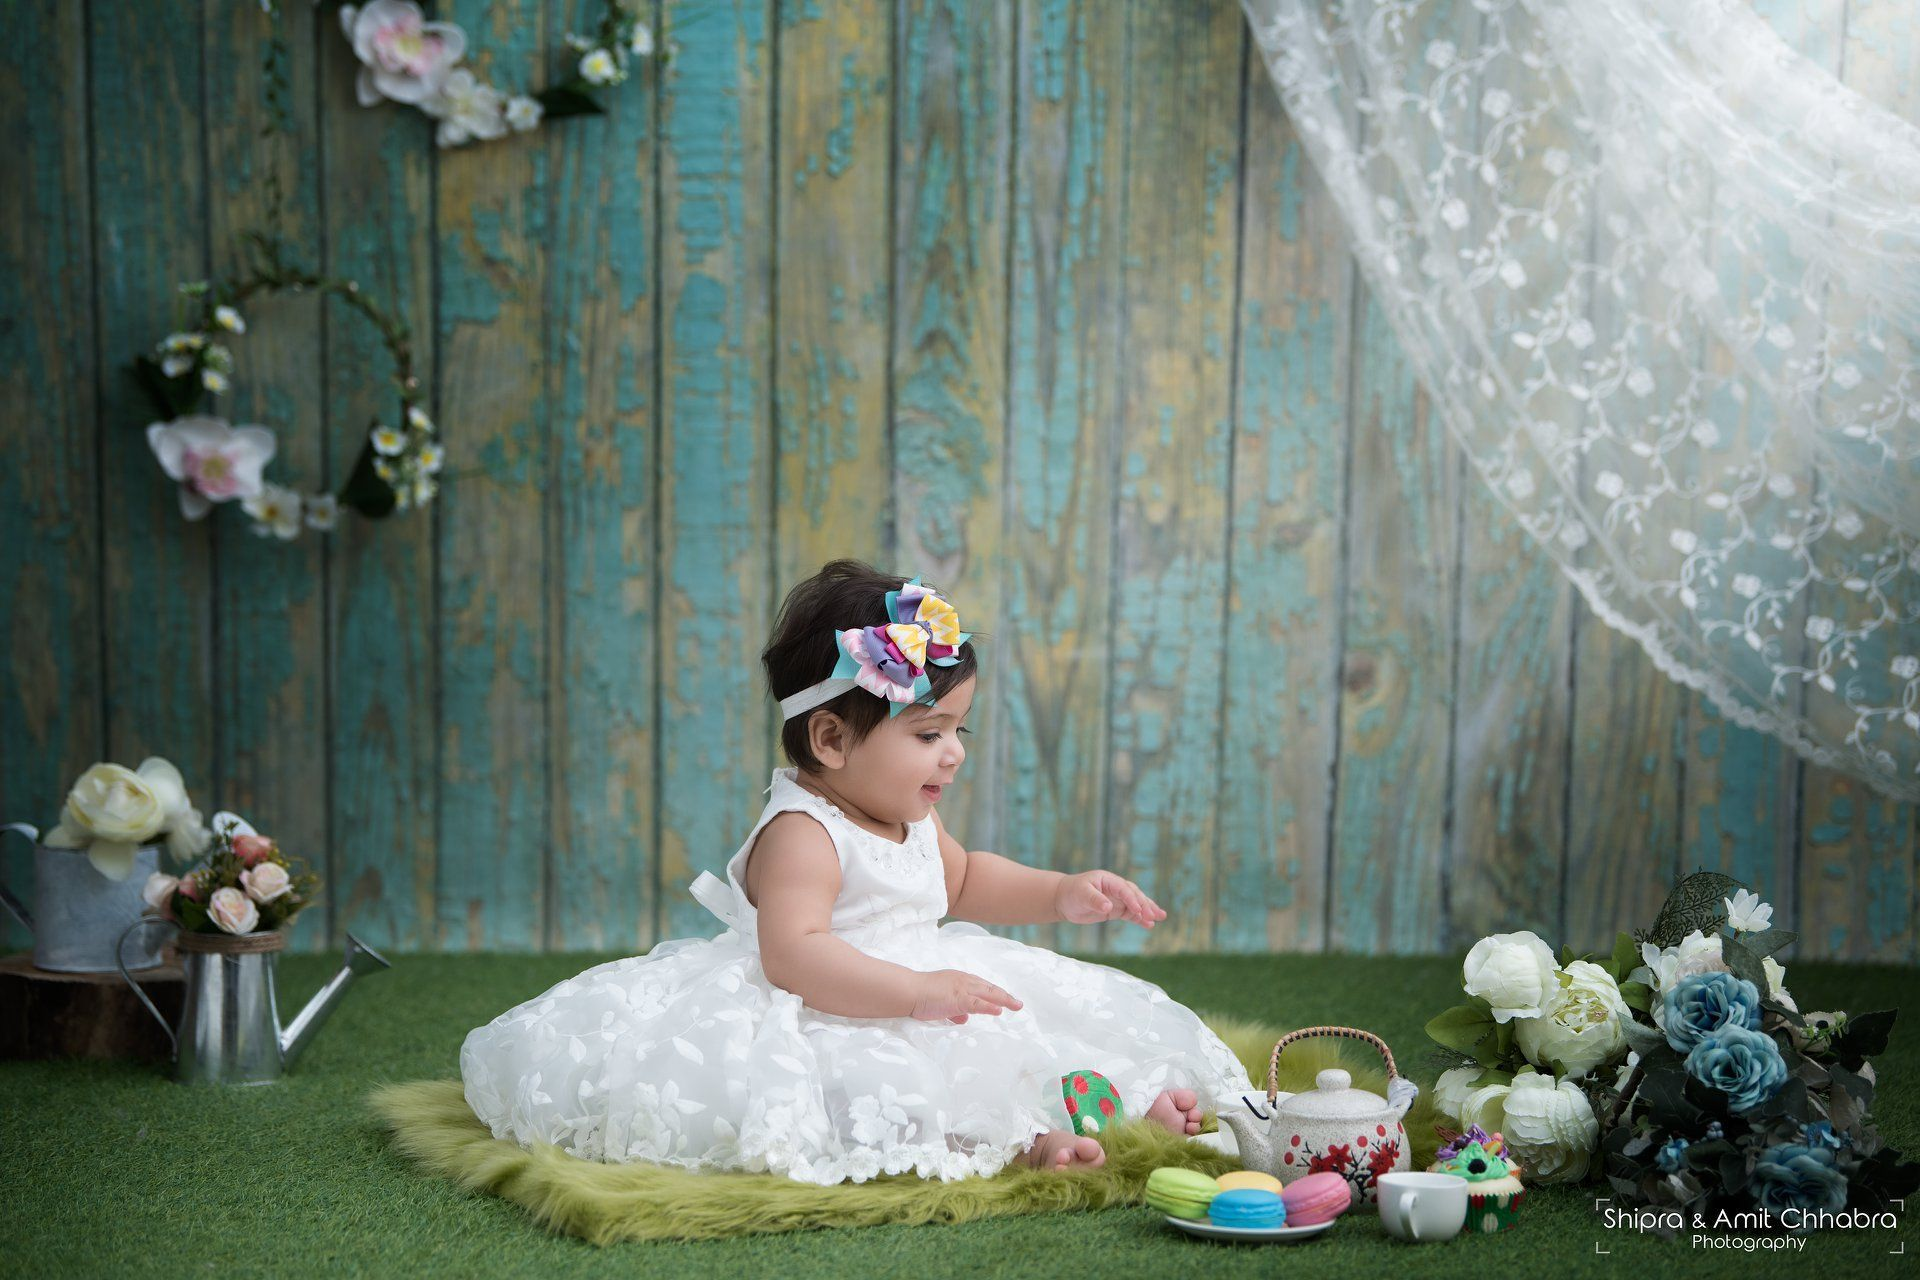 Baby photo shoot babu girl photo shoot ideas infant photography ideas garden theme set up floral theme shipra amit chhabra photography